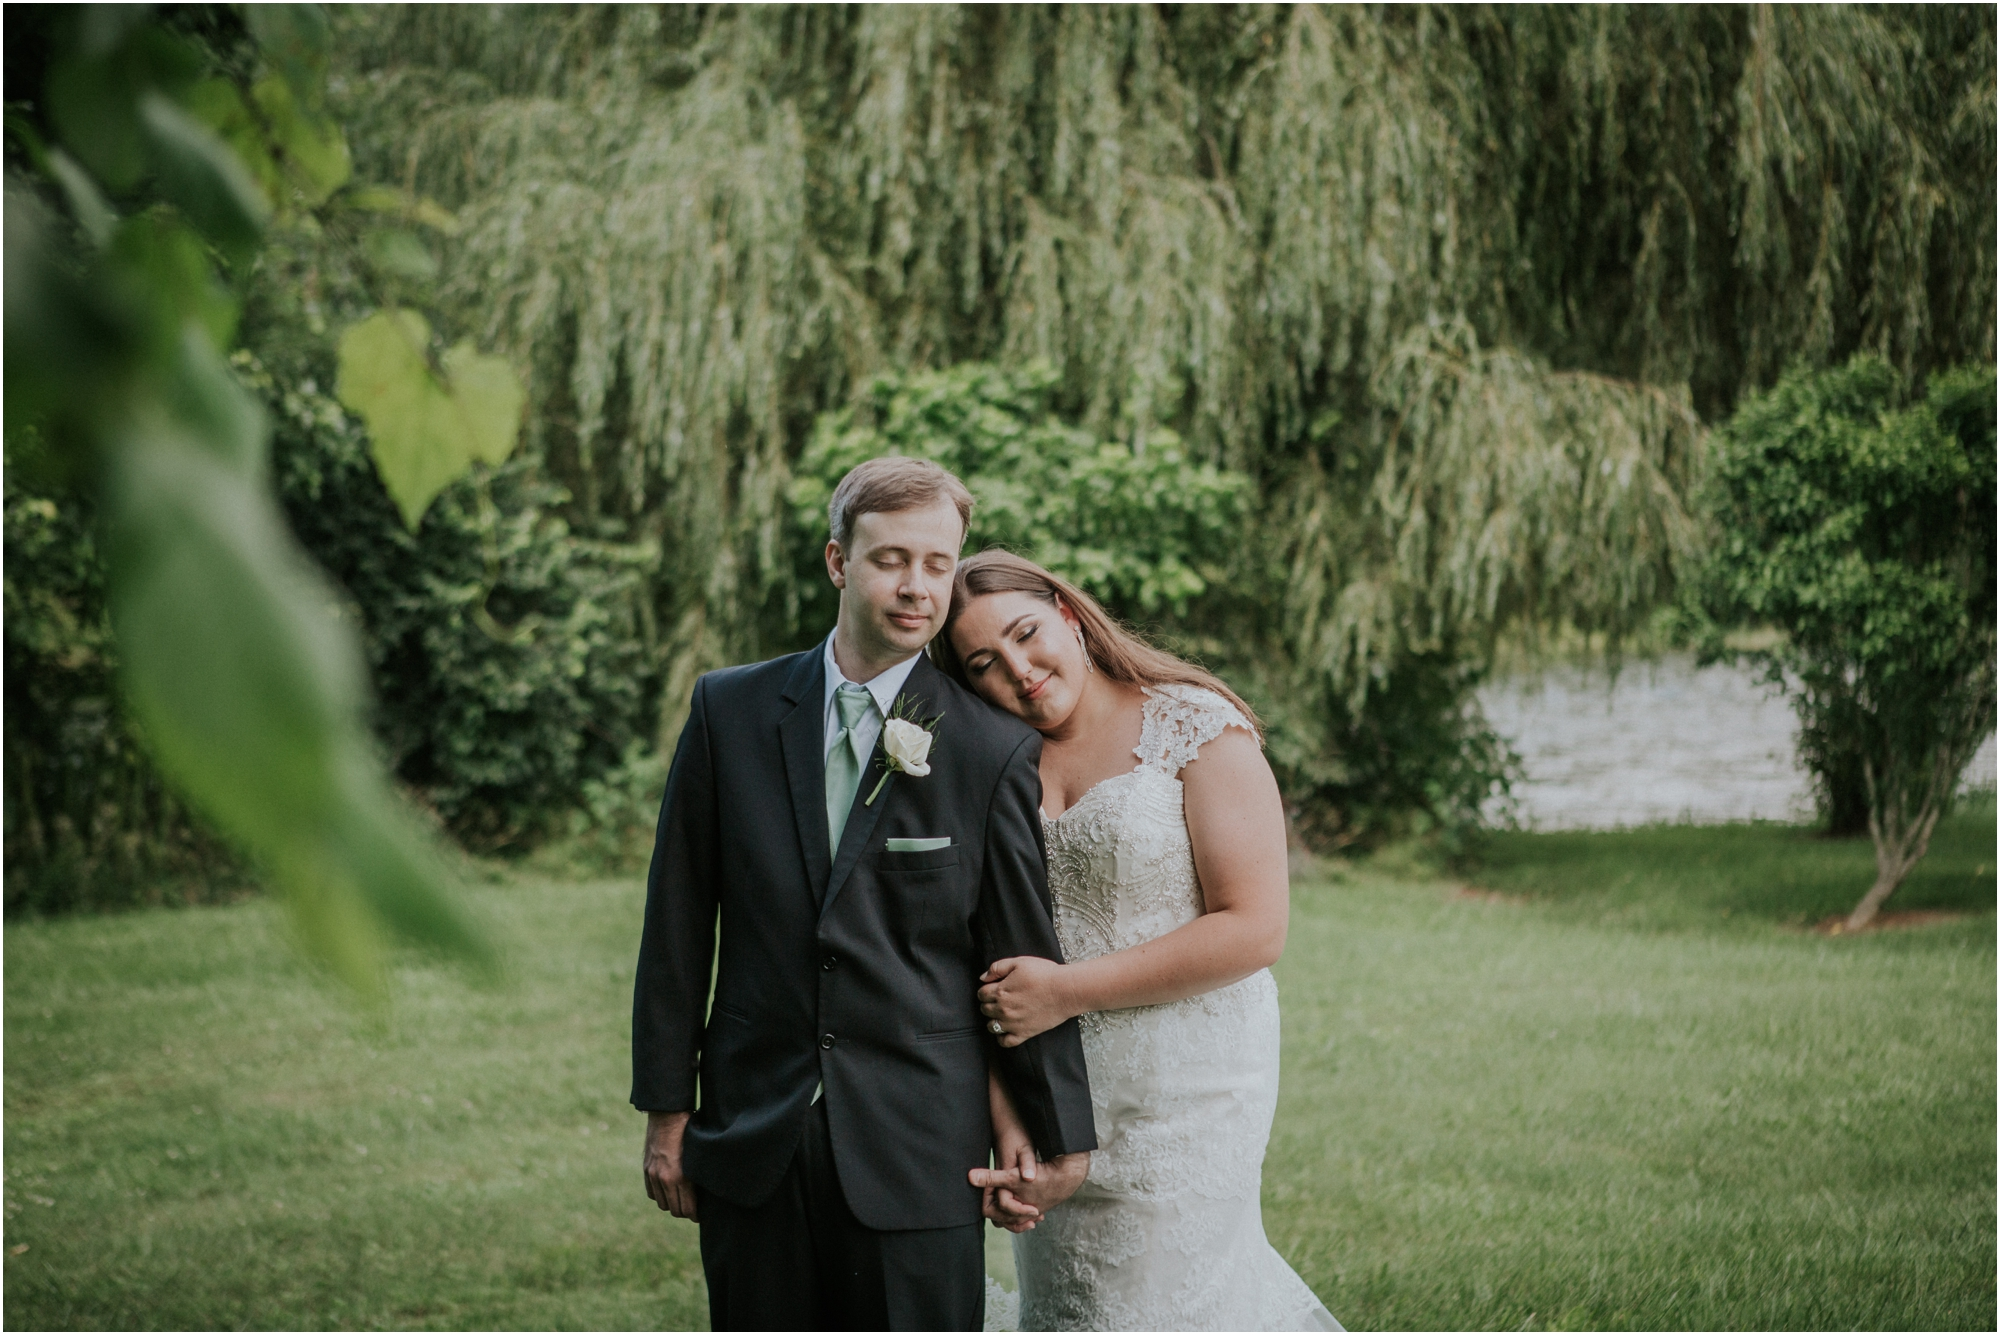 elizabethton-johnson-city-wedding-elopement-engagement-pink-green-summer-adventurous-couple-tennessee_0046.jpg